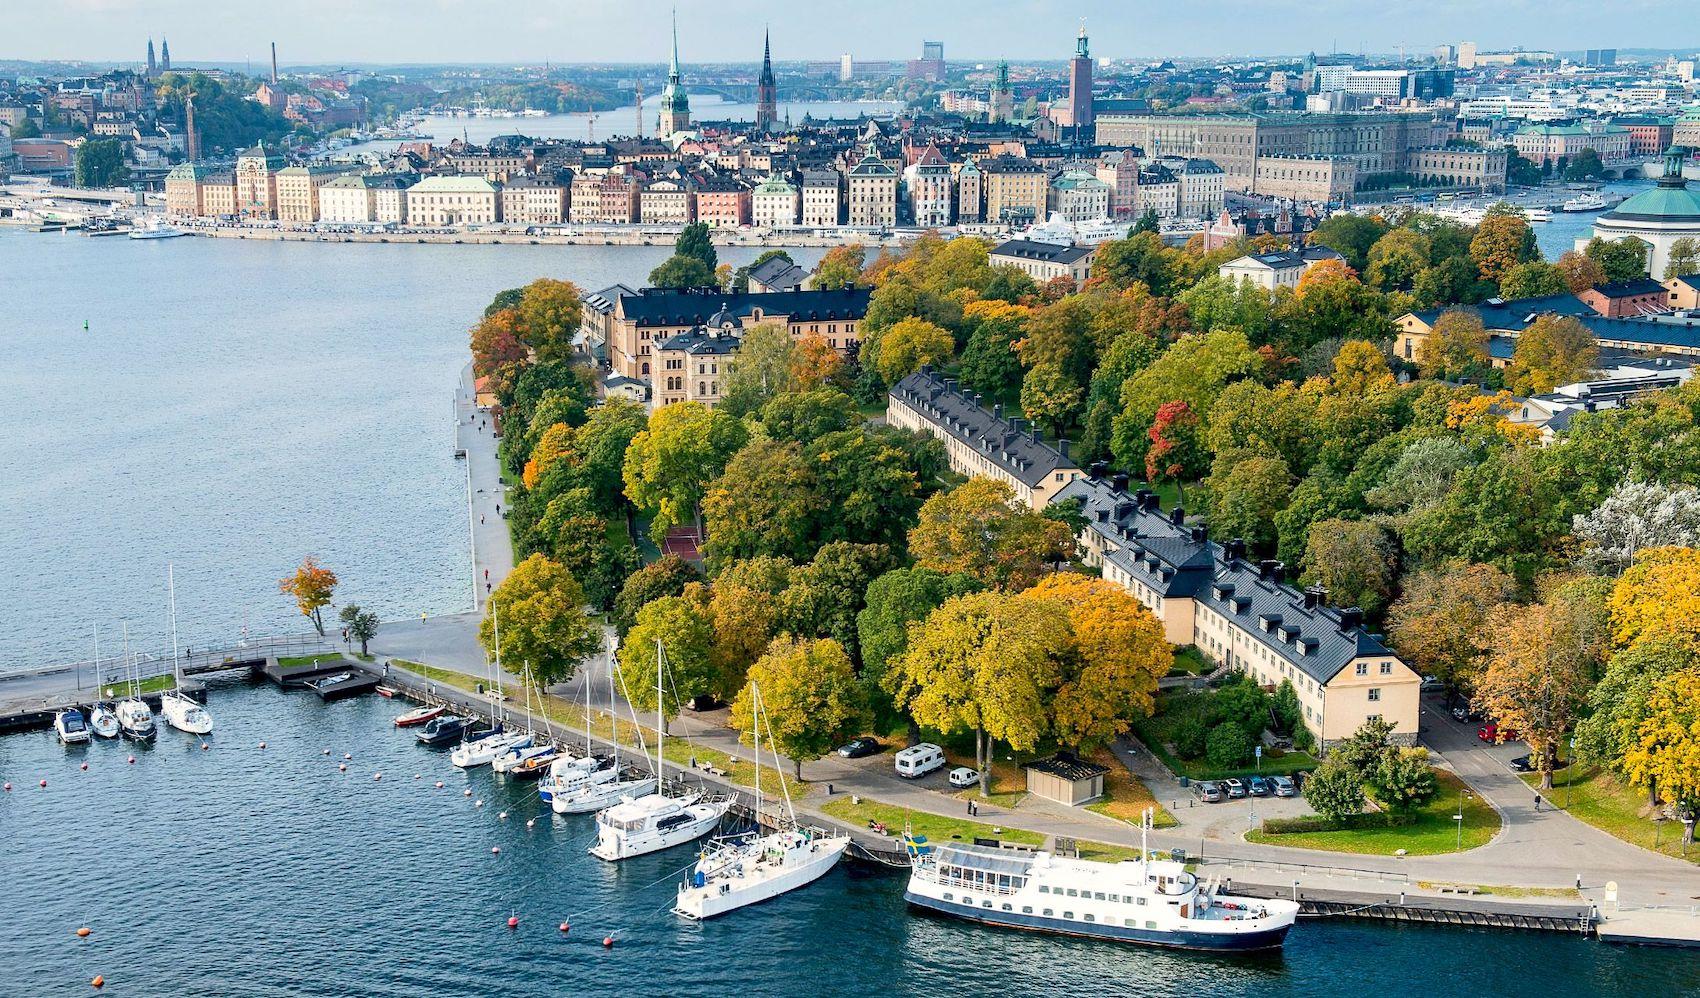 Stockholm city aerial shot during daytime.